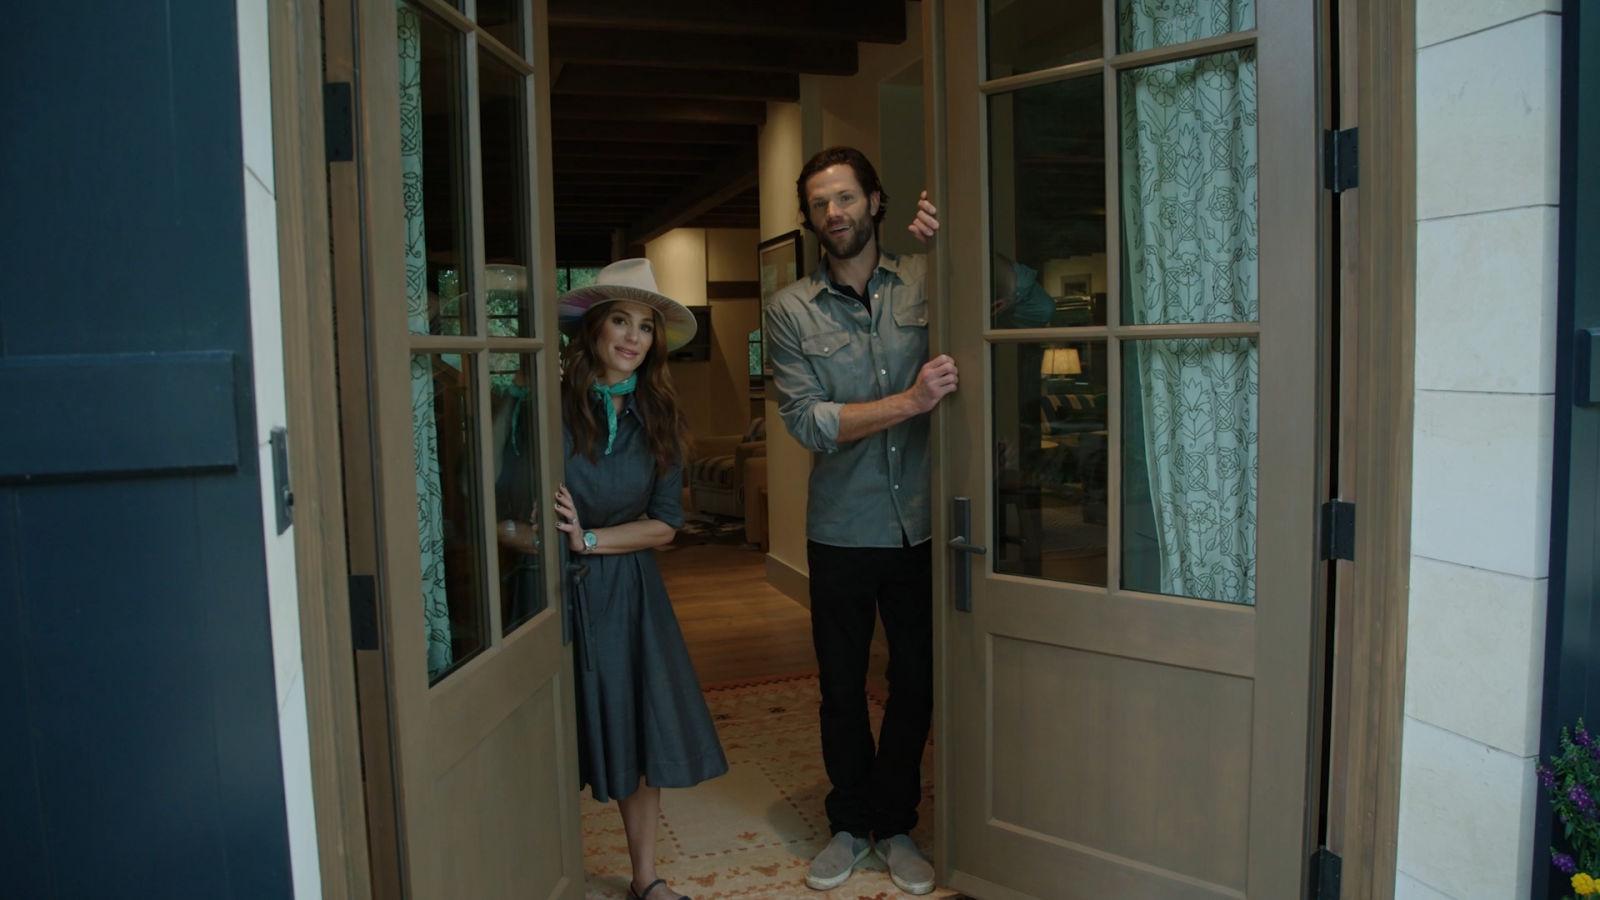 Jared Padalecki (Supernatural): entramos en su casa familiar estilo granja